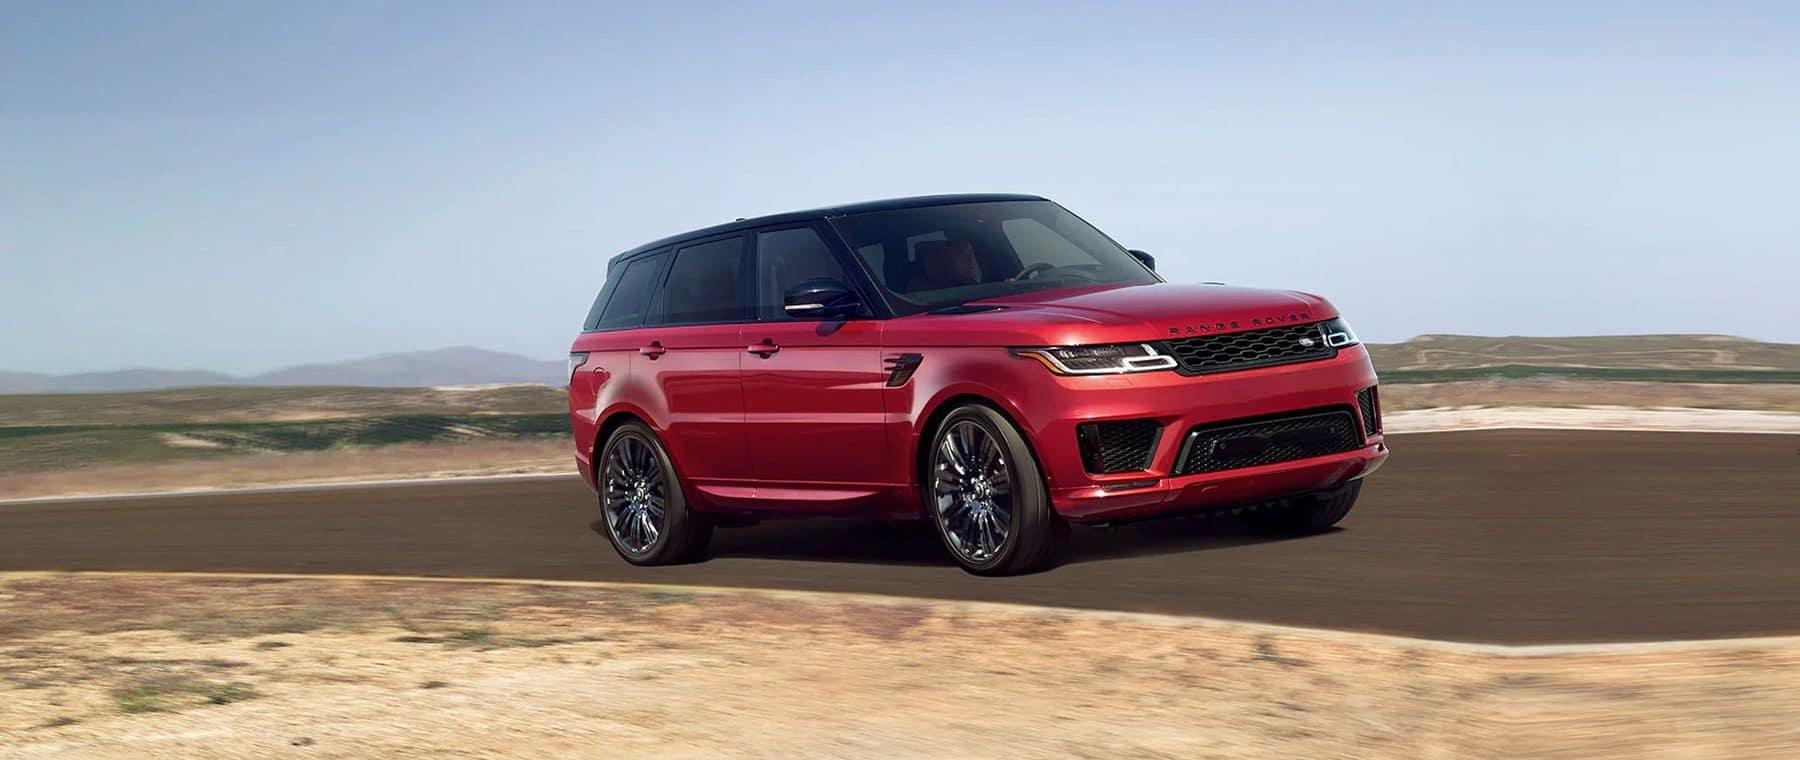 Land Rover Okc >> Your Land Rover Range Rover Dealership in OKC | Land Rover Oklahoma City